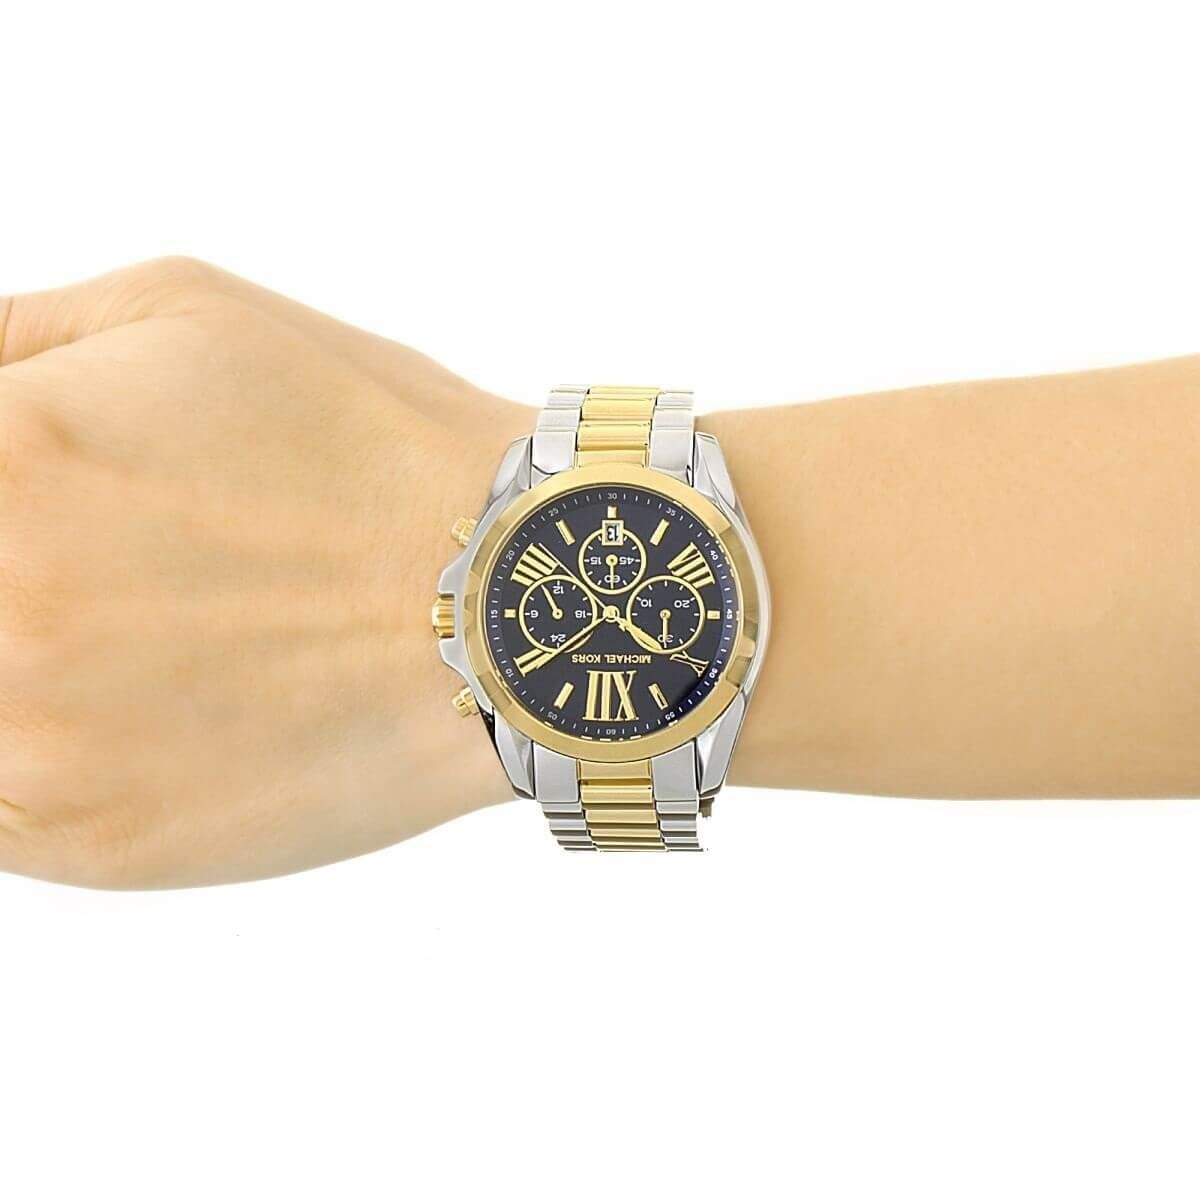 Relógio Analógico Michael Kors MK5976 5AN - Compre Agora   Zattini 15f33c3f38